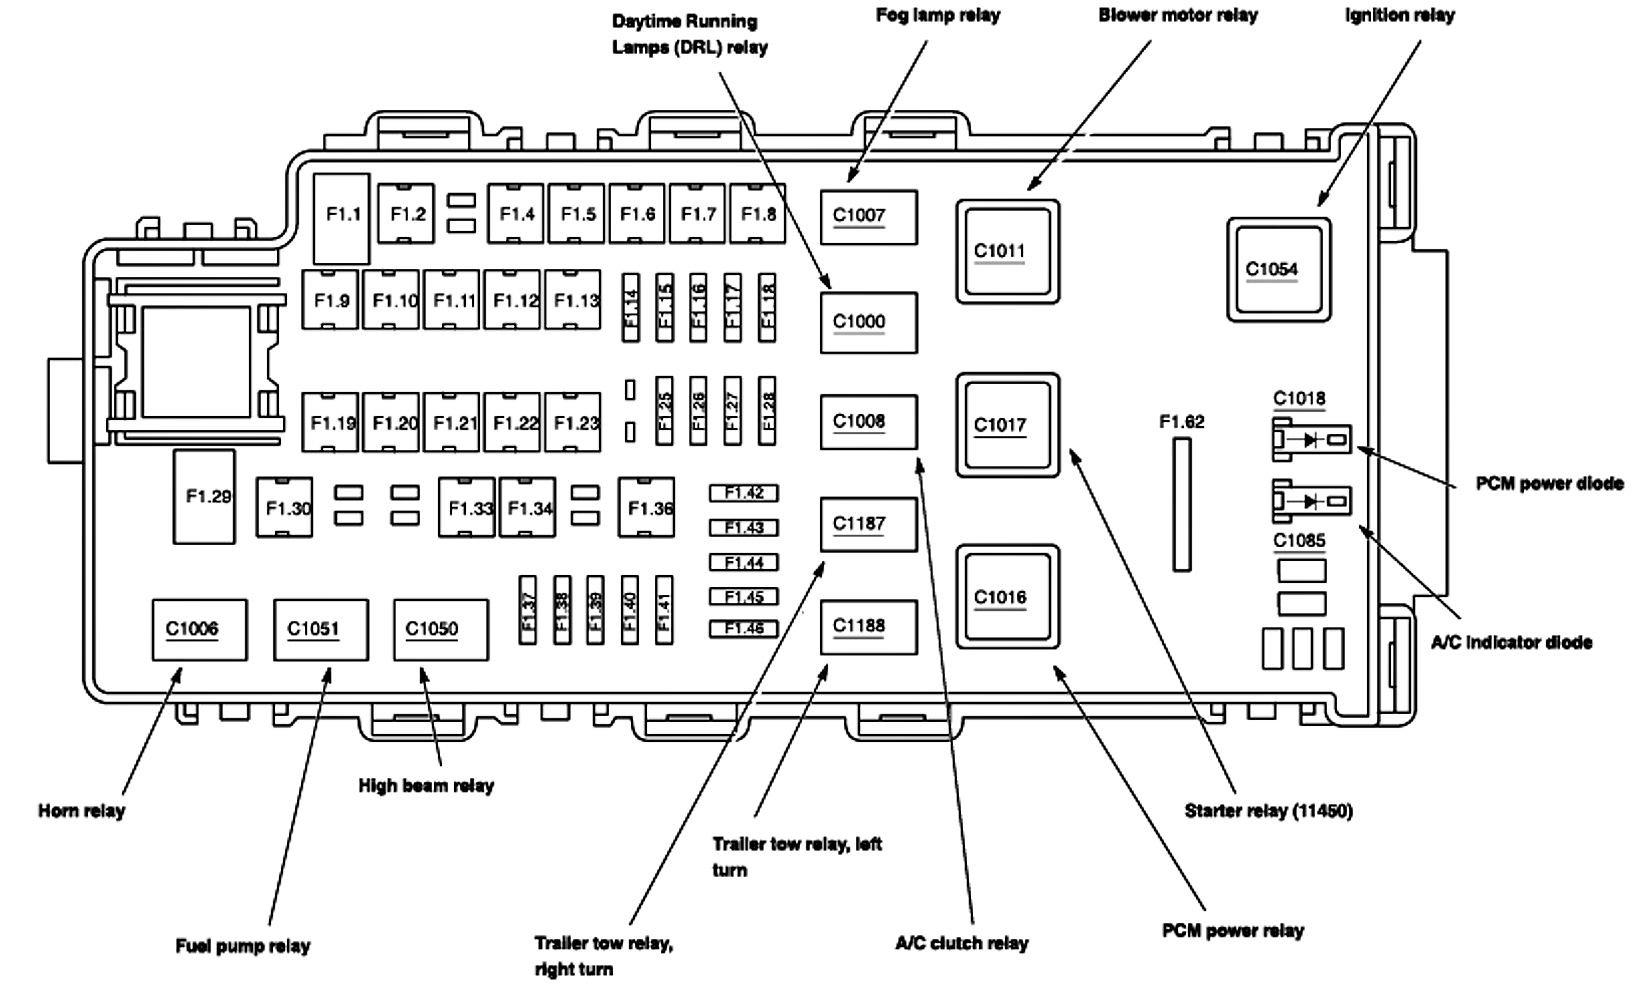 05 Ford Explorer Wiring Diagram